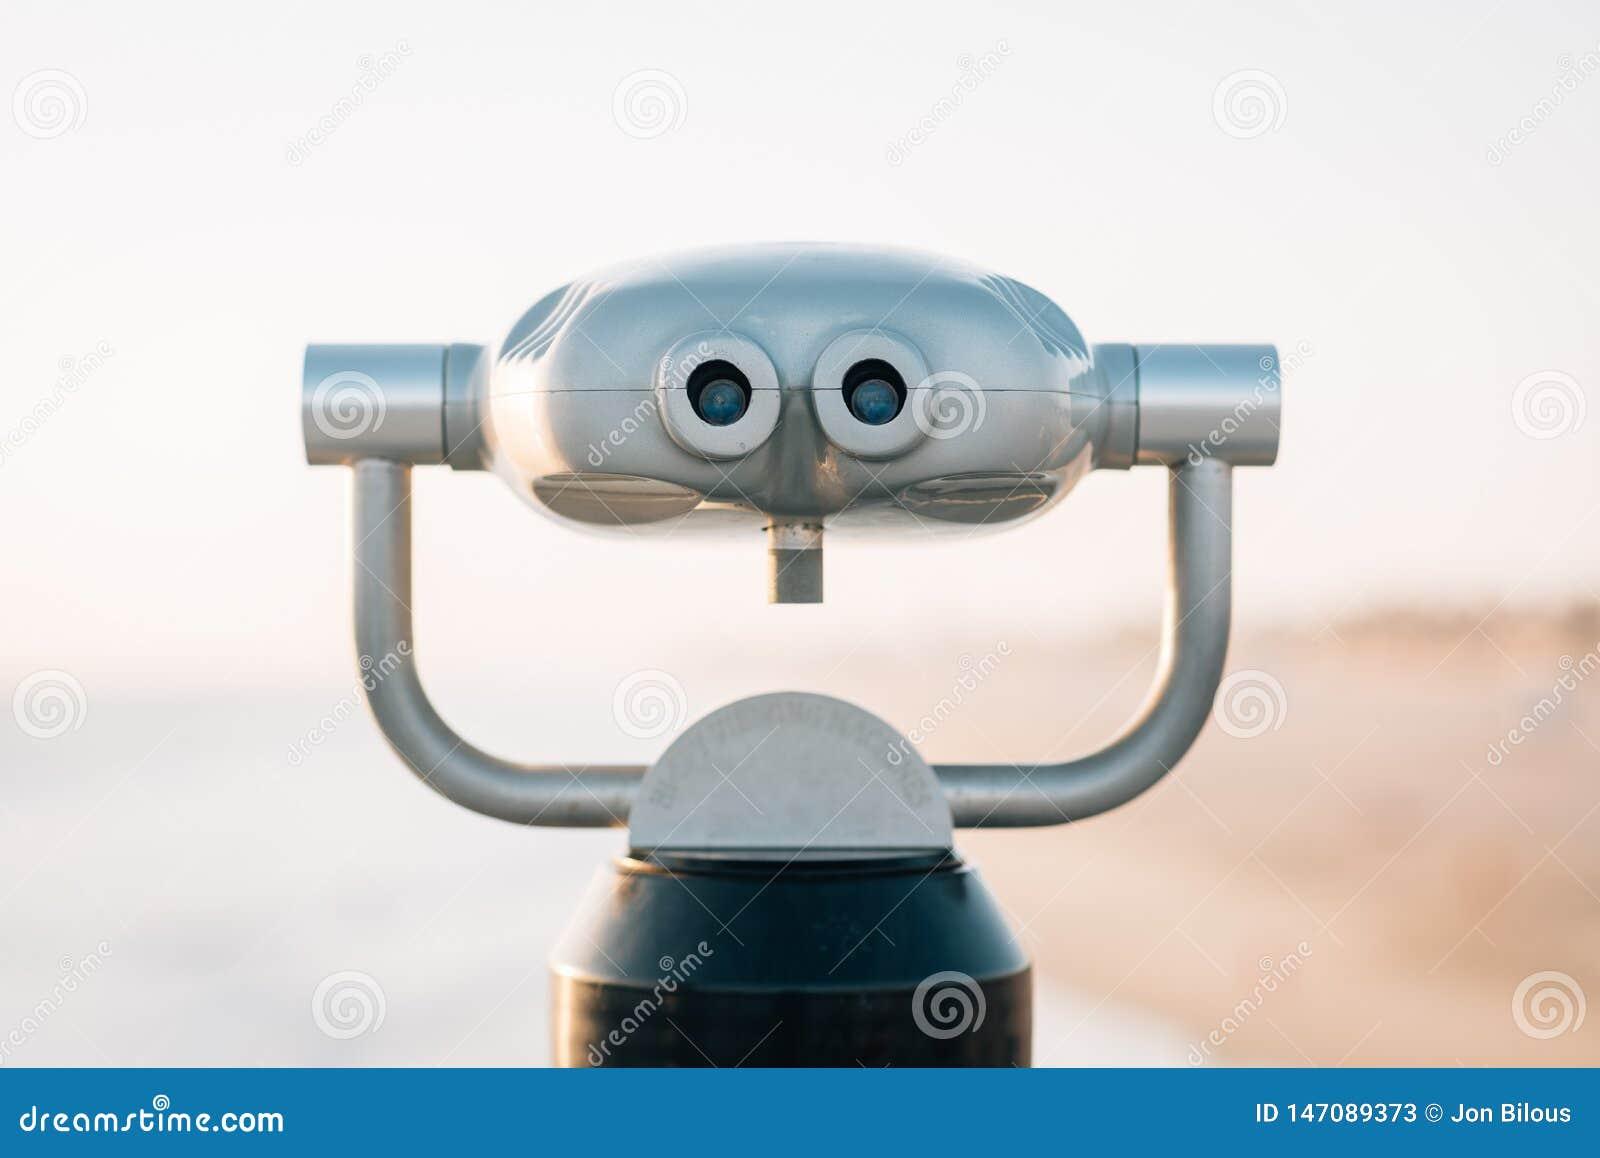 Binoculars At Huntington Beach Pier Stock Image - Image of